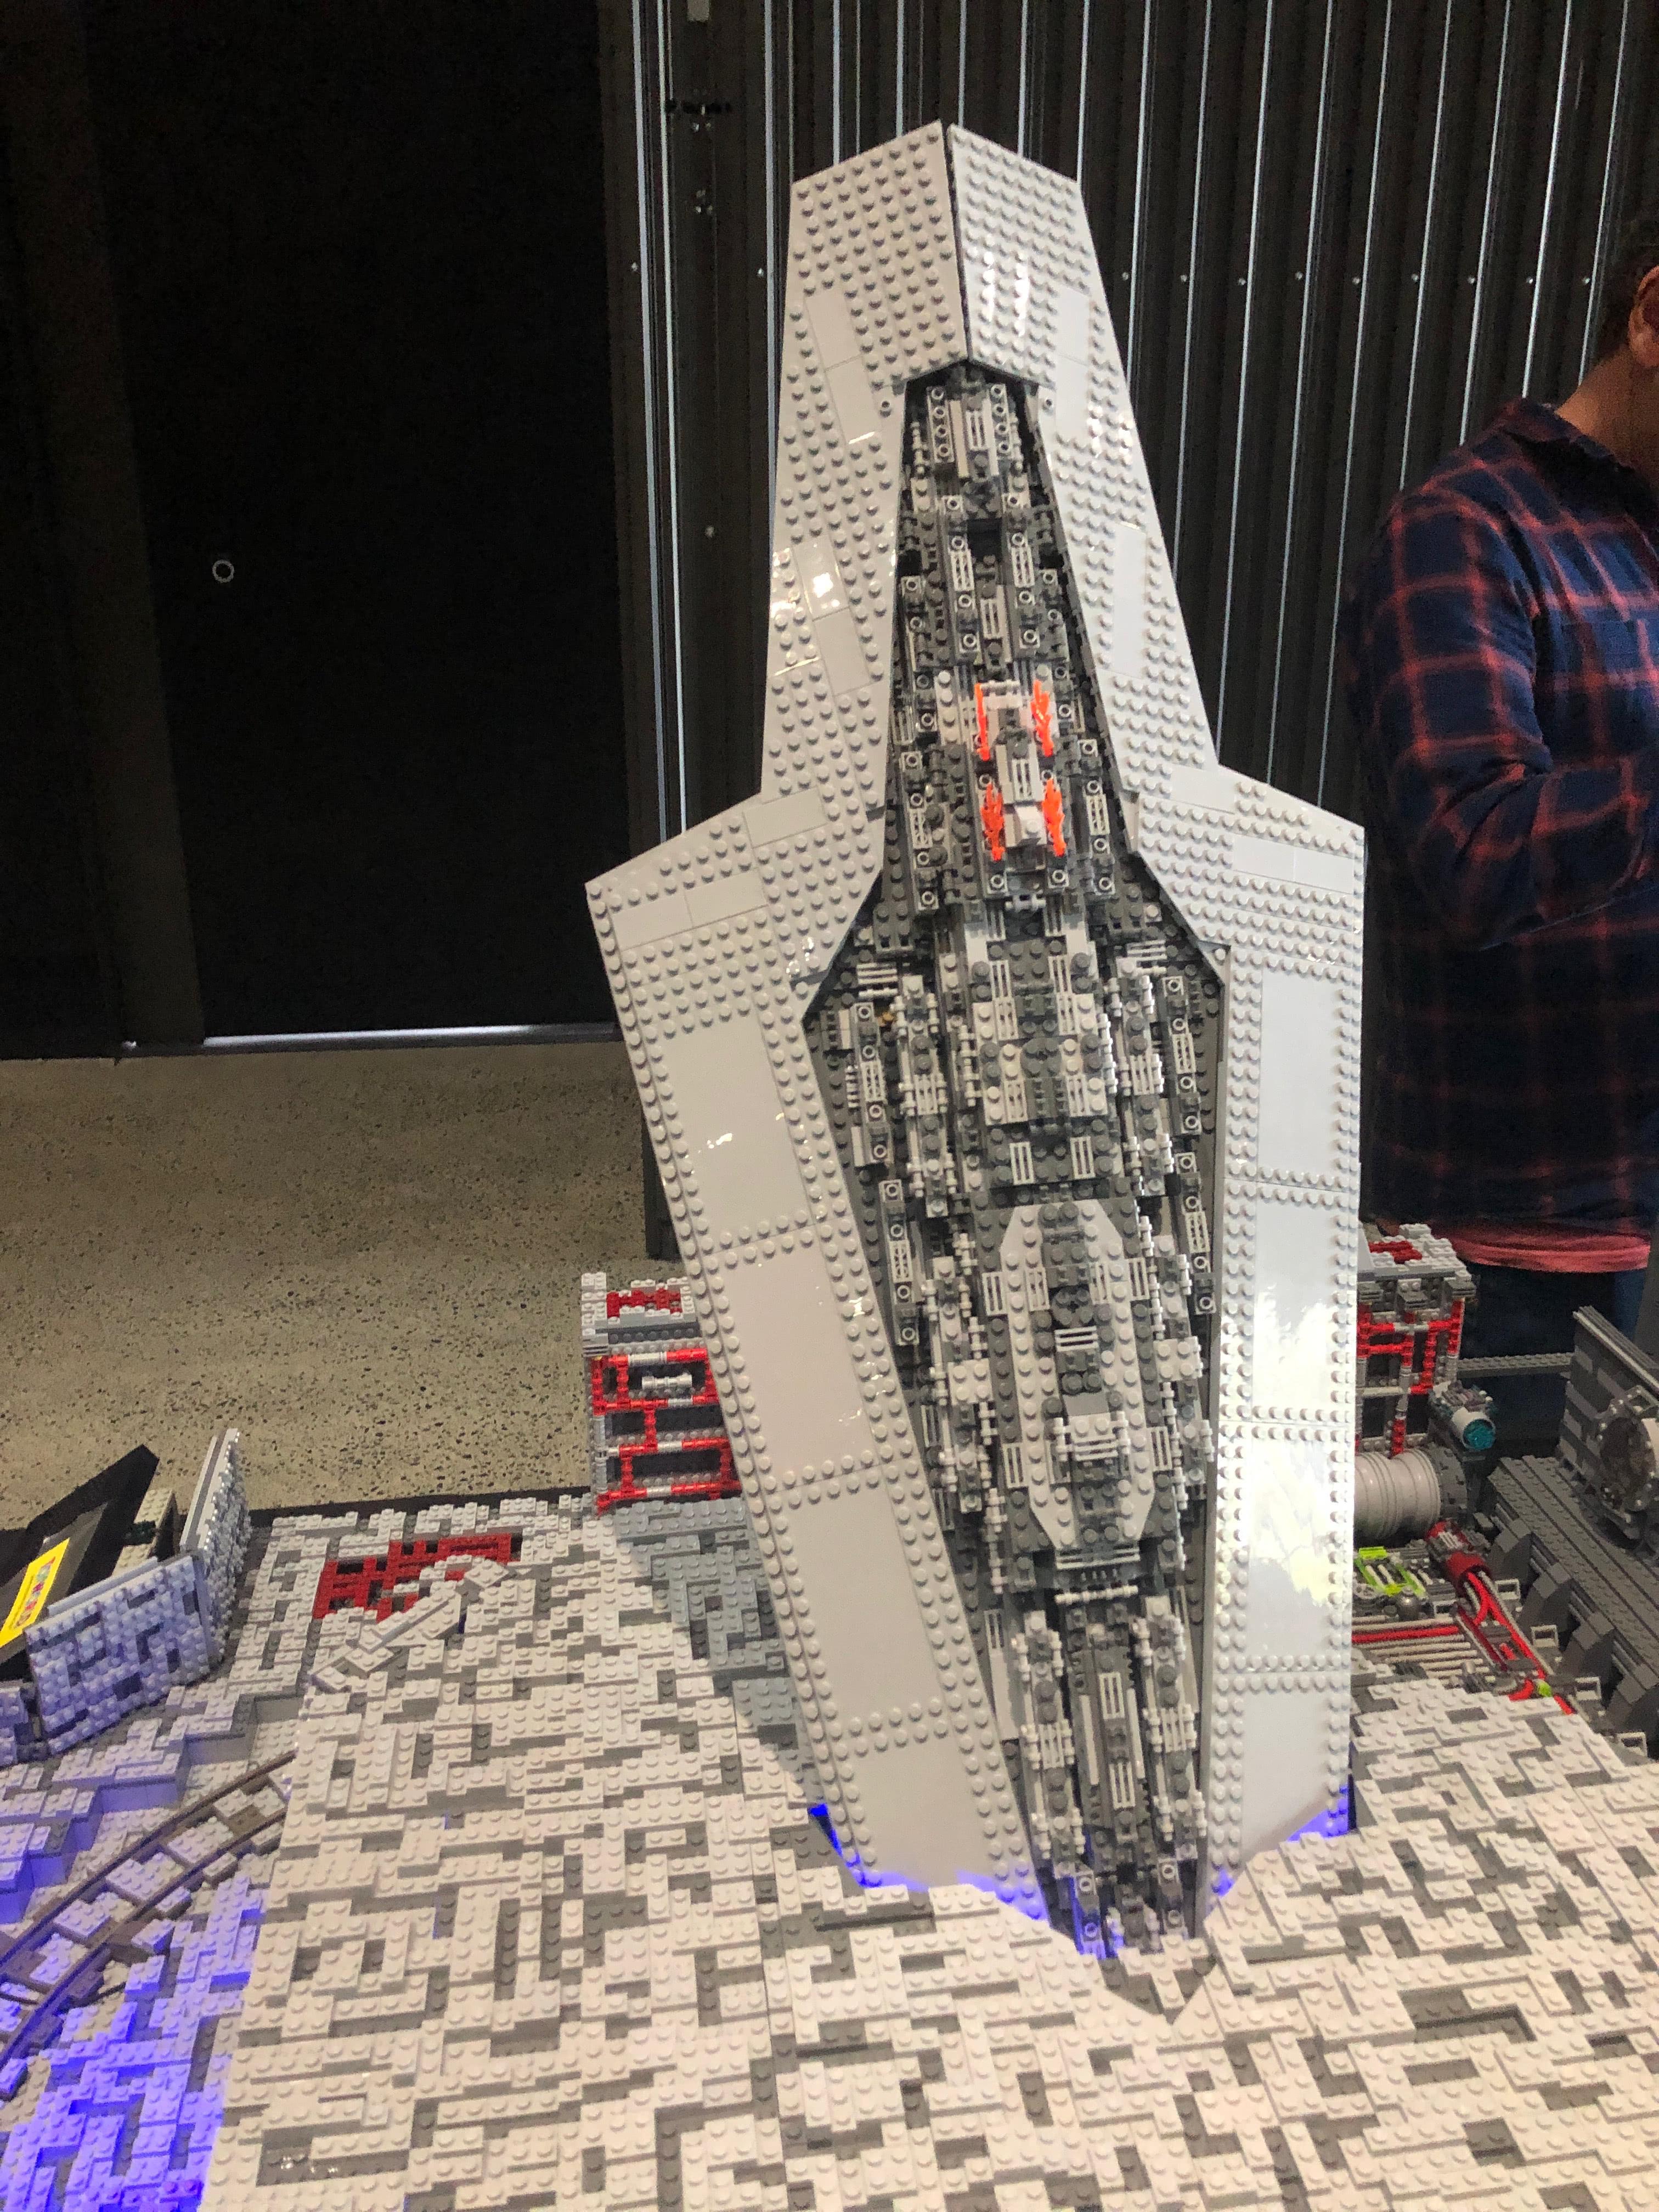 Star destroyer crashing in to the Death Star